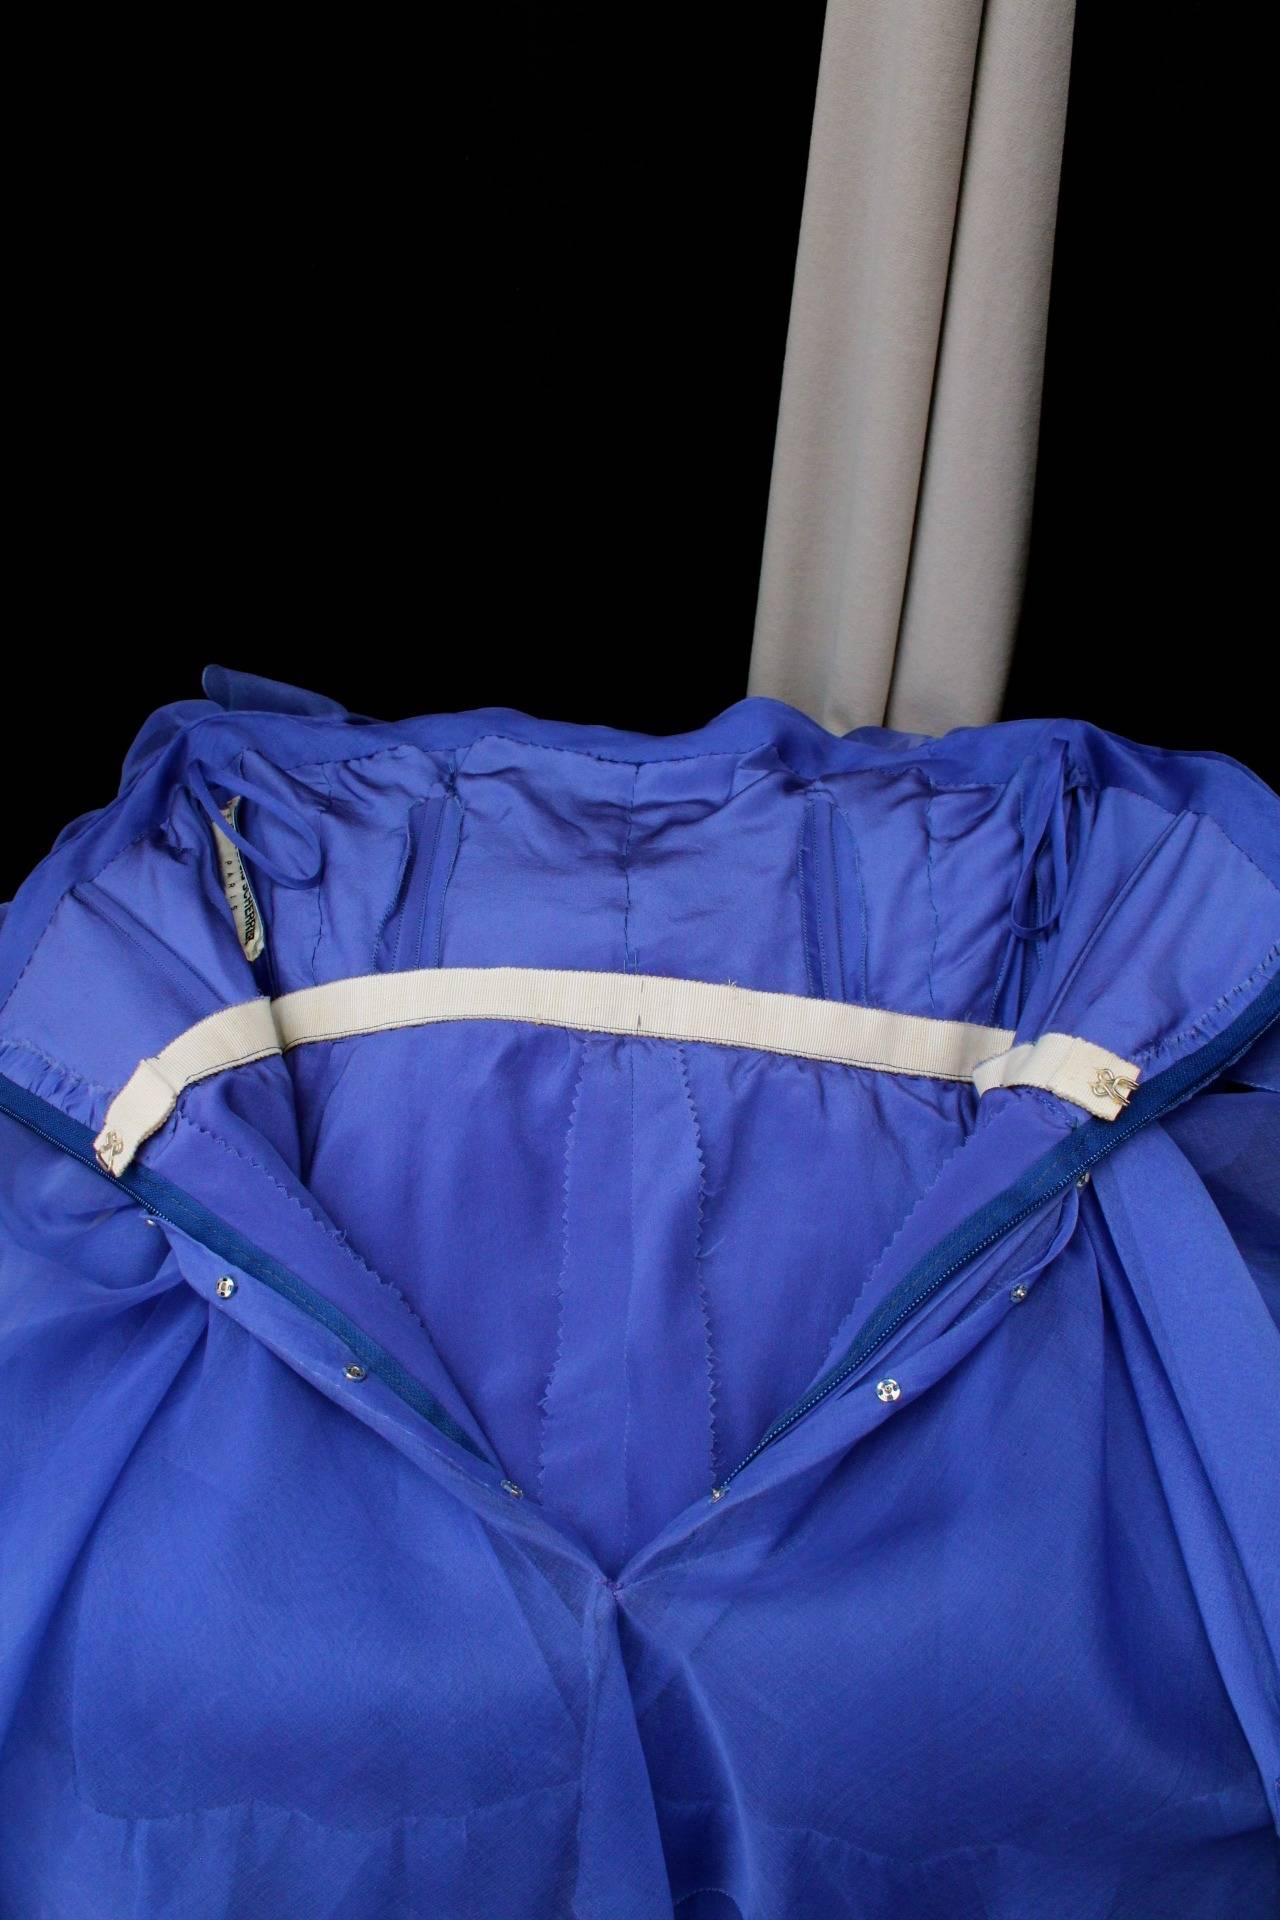 Jean-Louis Scherrer Haute Couture Blue Organza Evening Gown, 1980s  For Sale 3